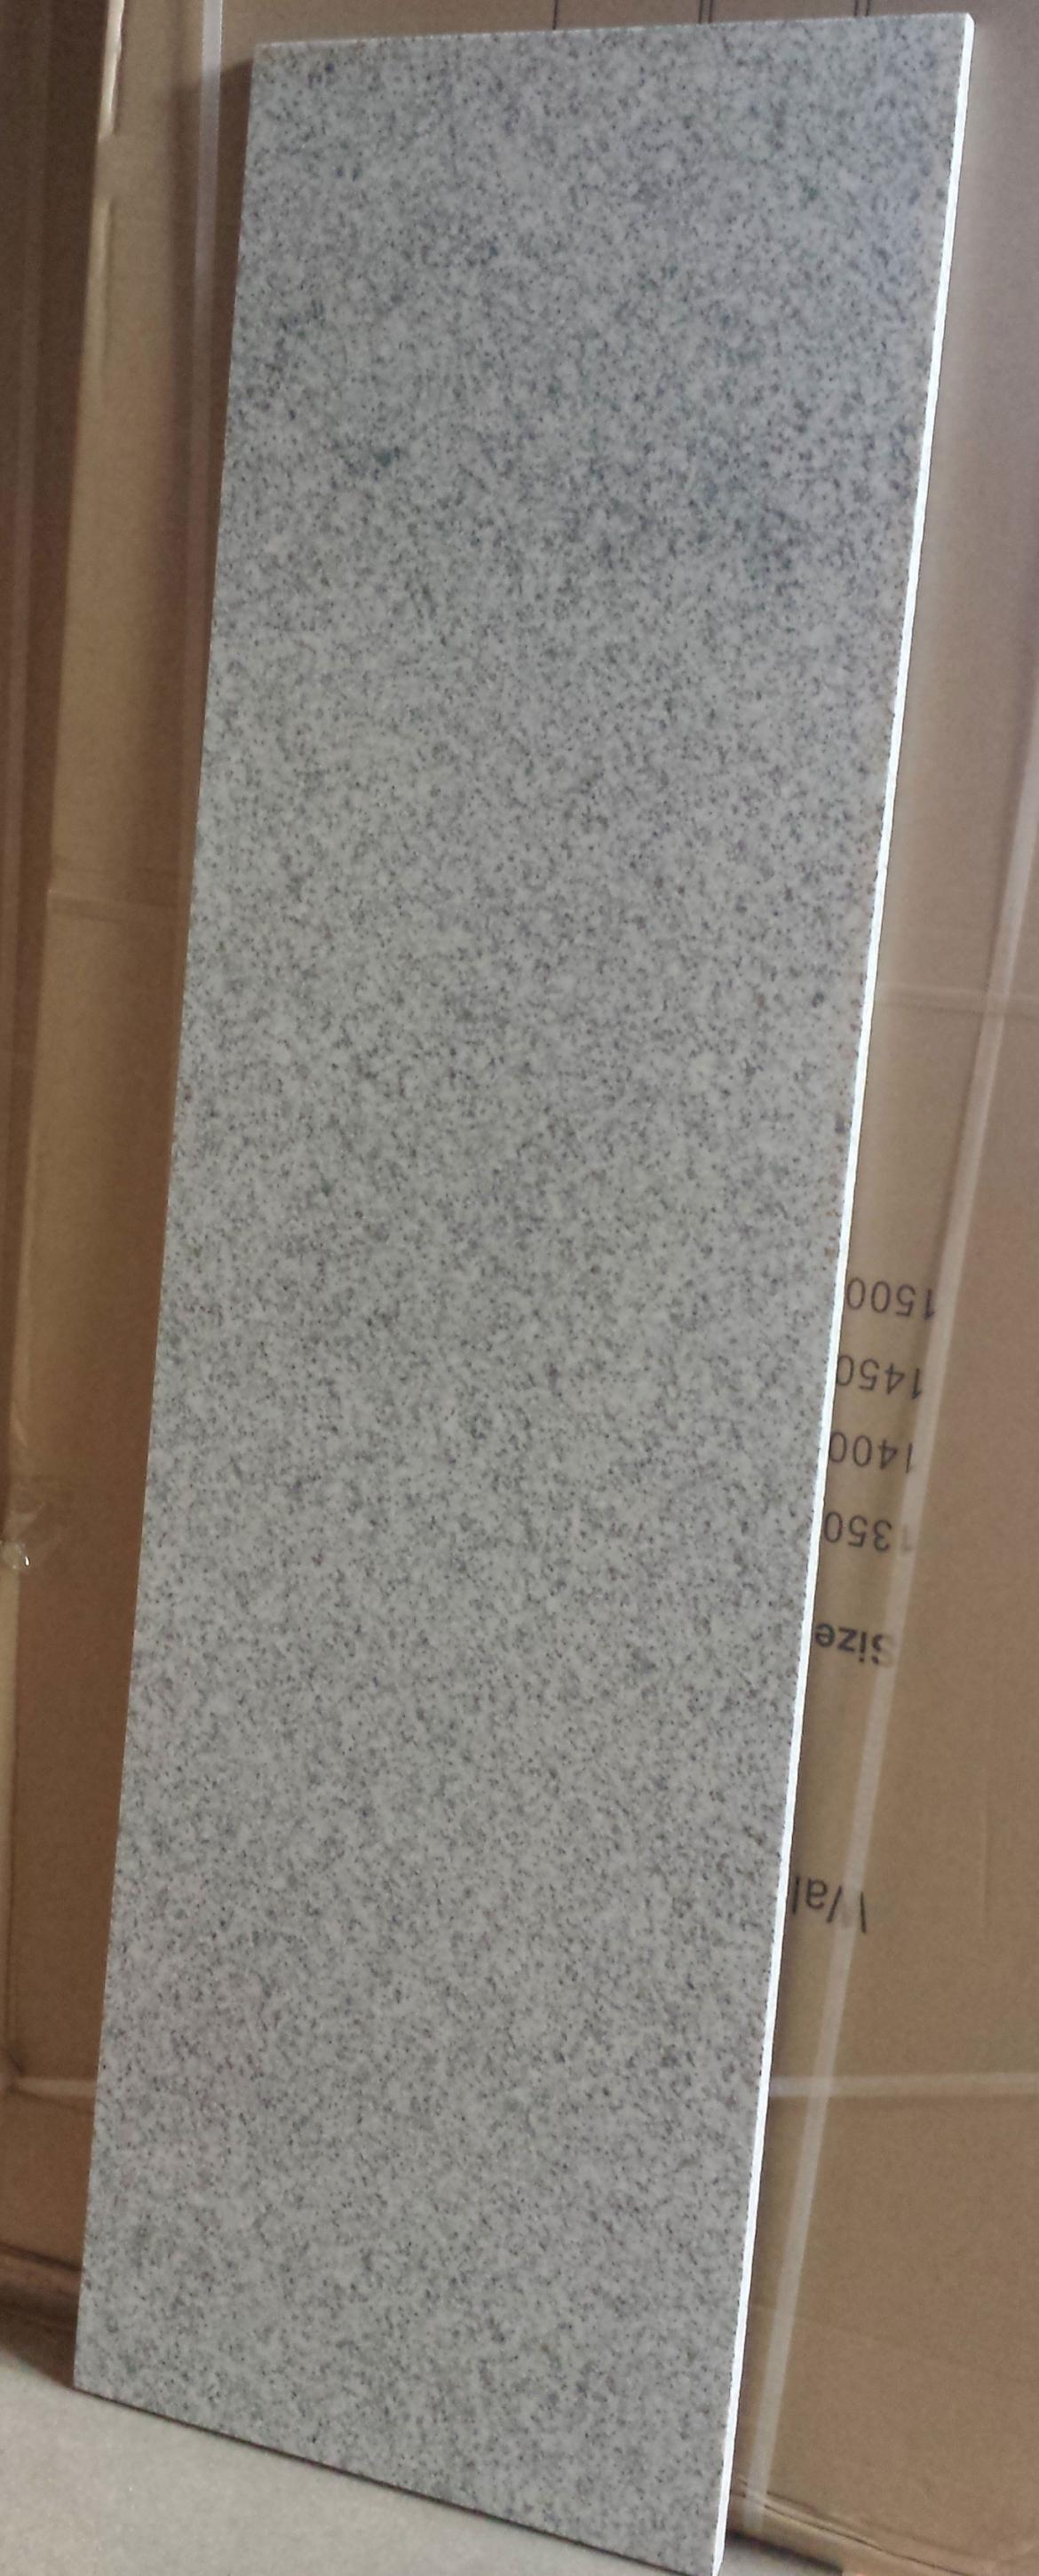 Black/White Granite Bench top for bathroom vanity [1300×470 mm]